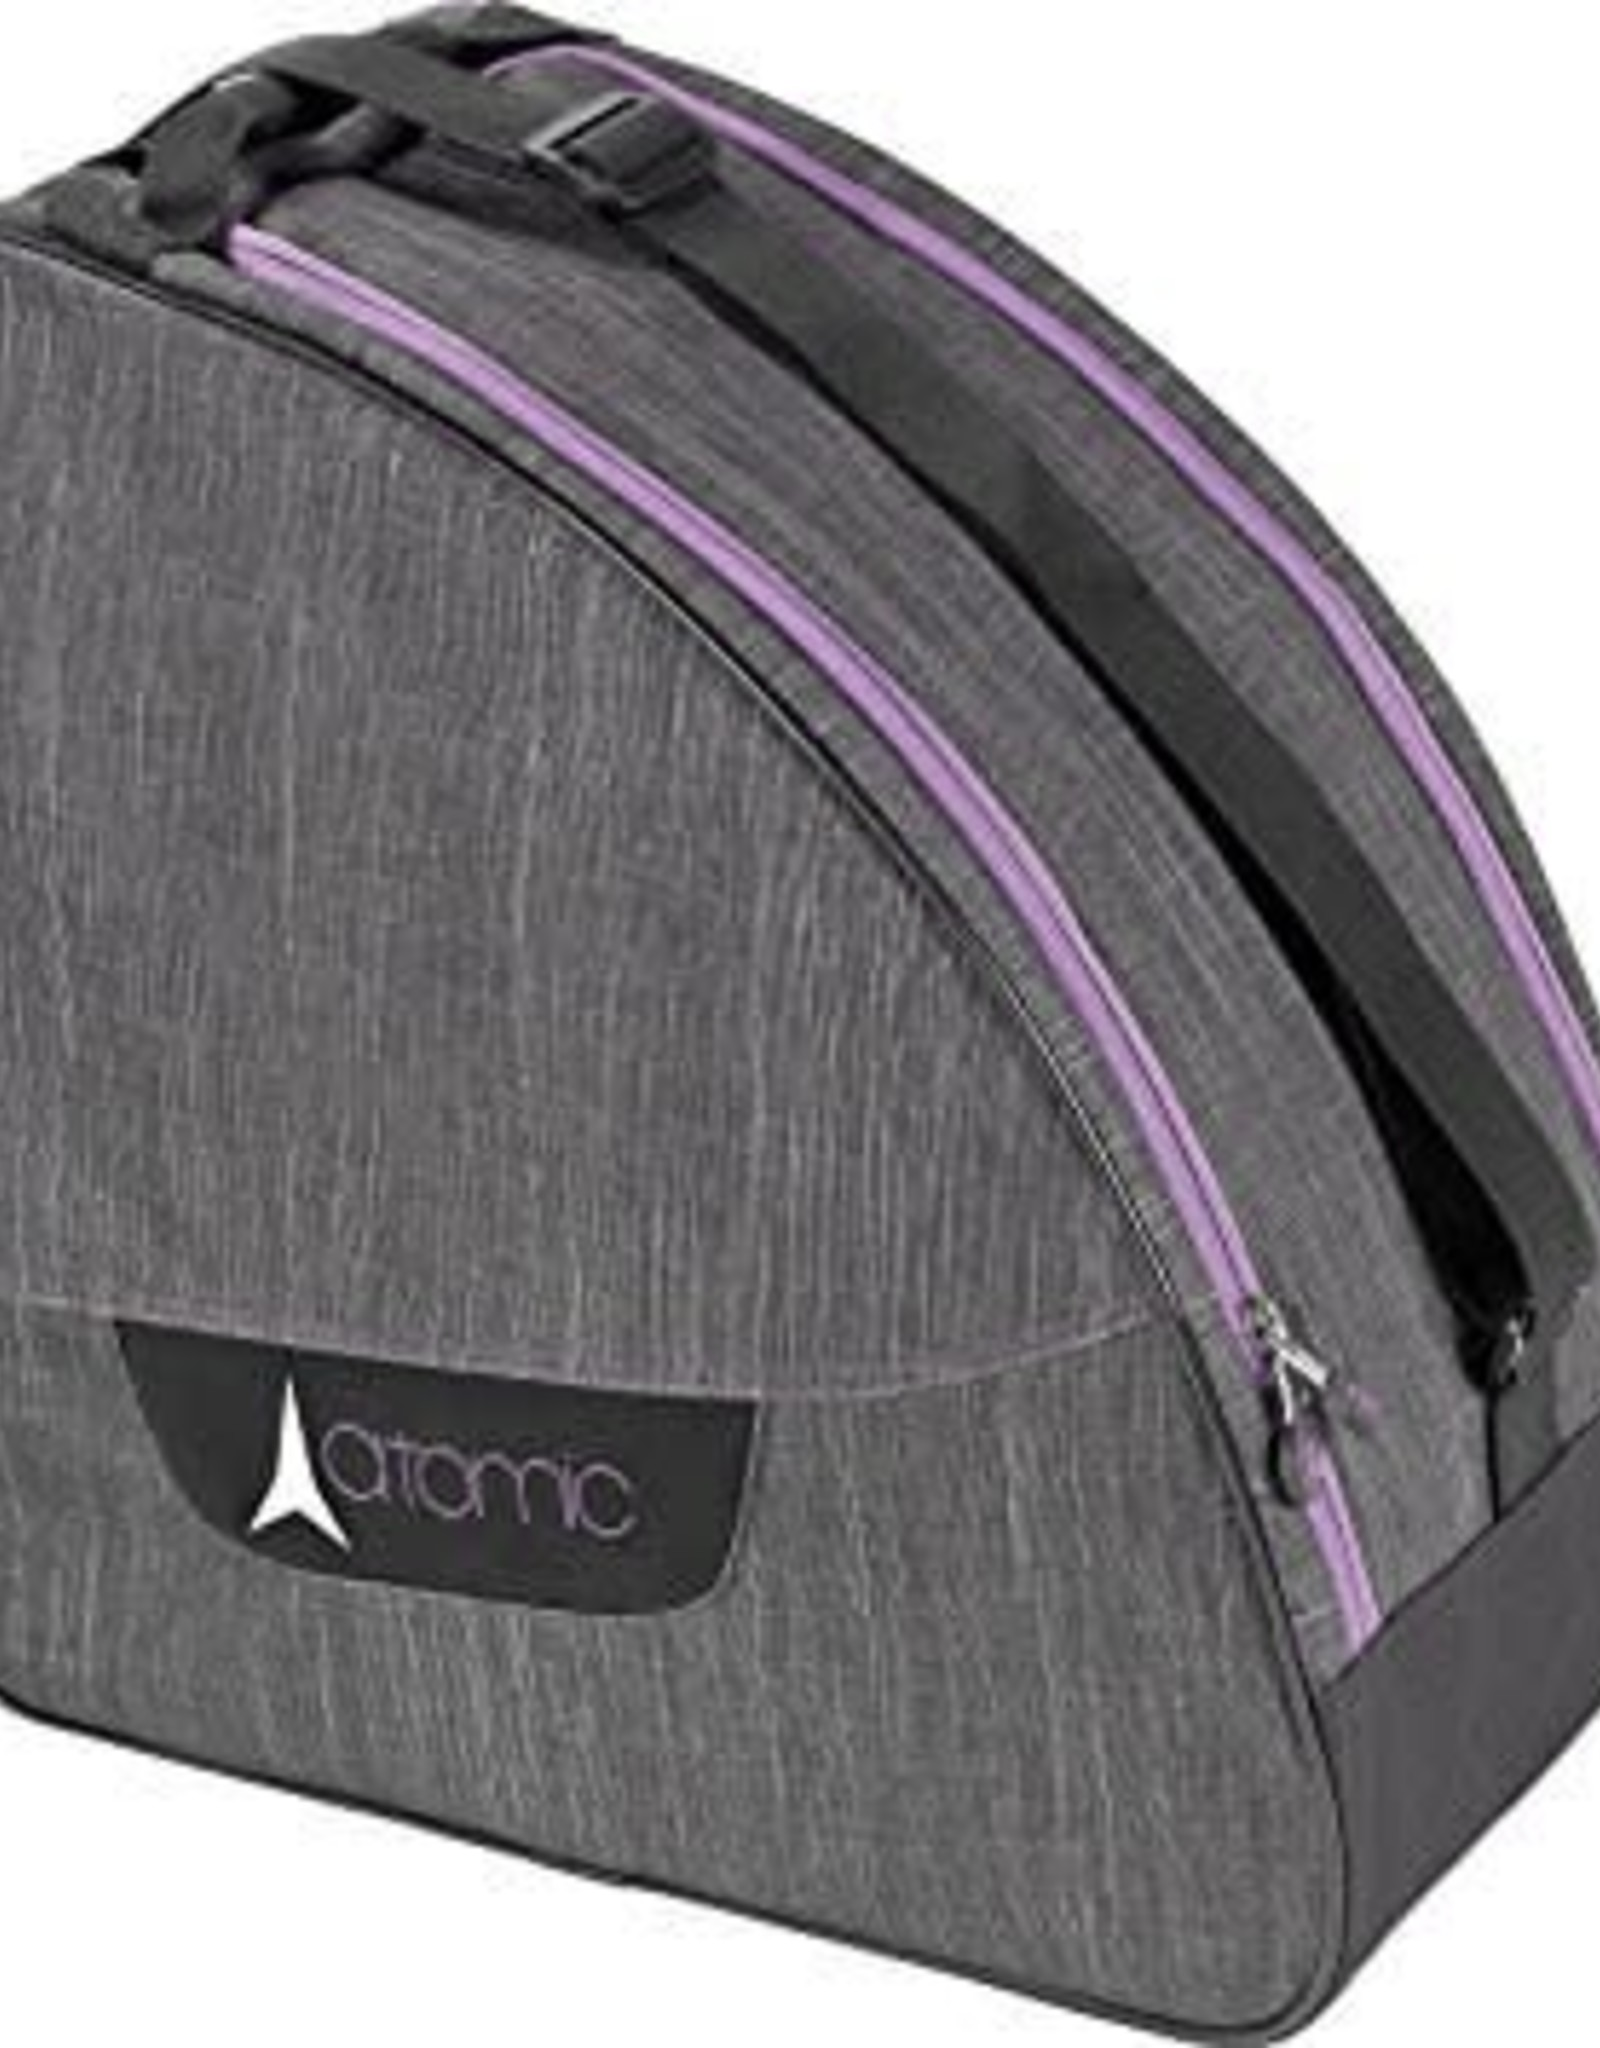 Atomic W boots bag